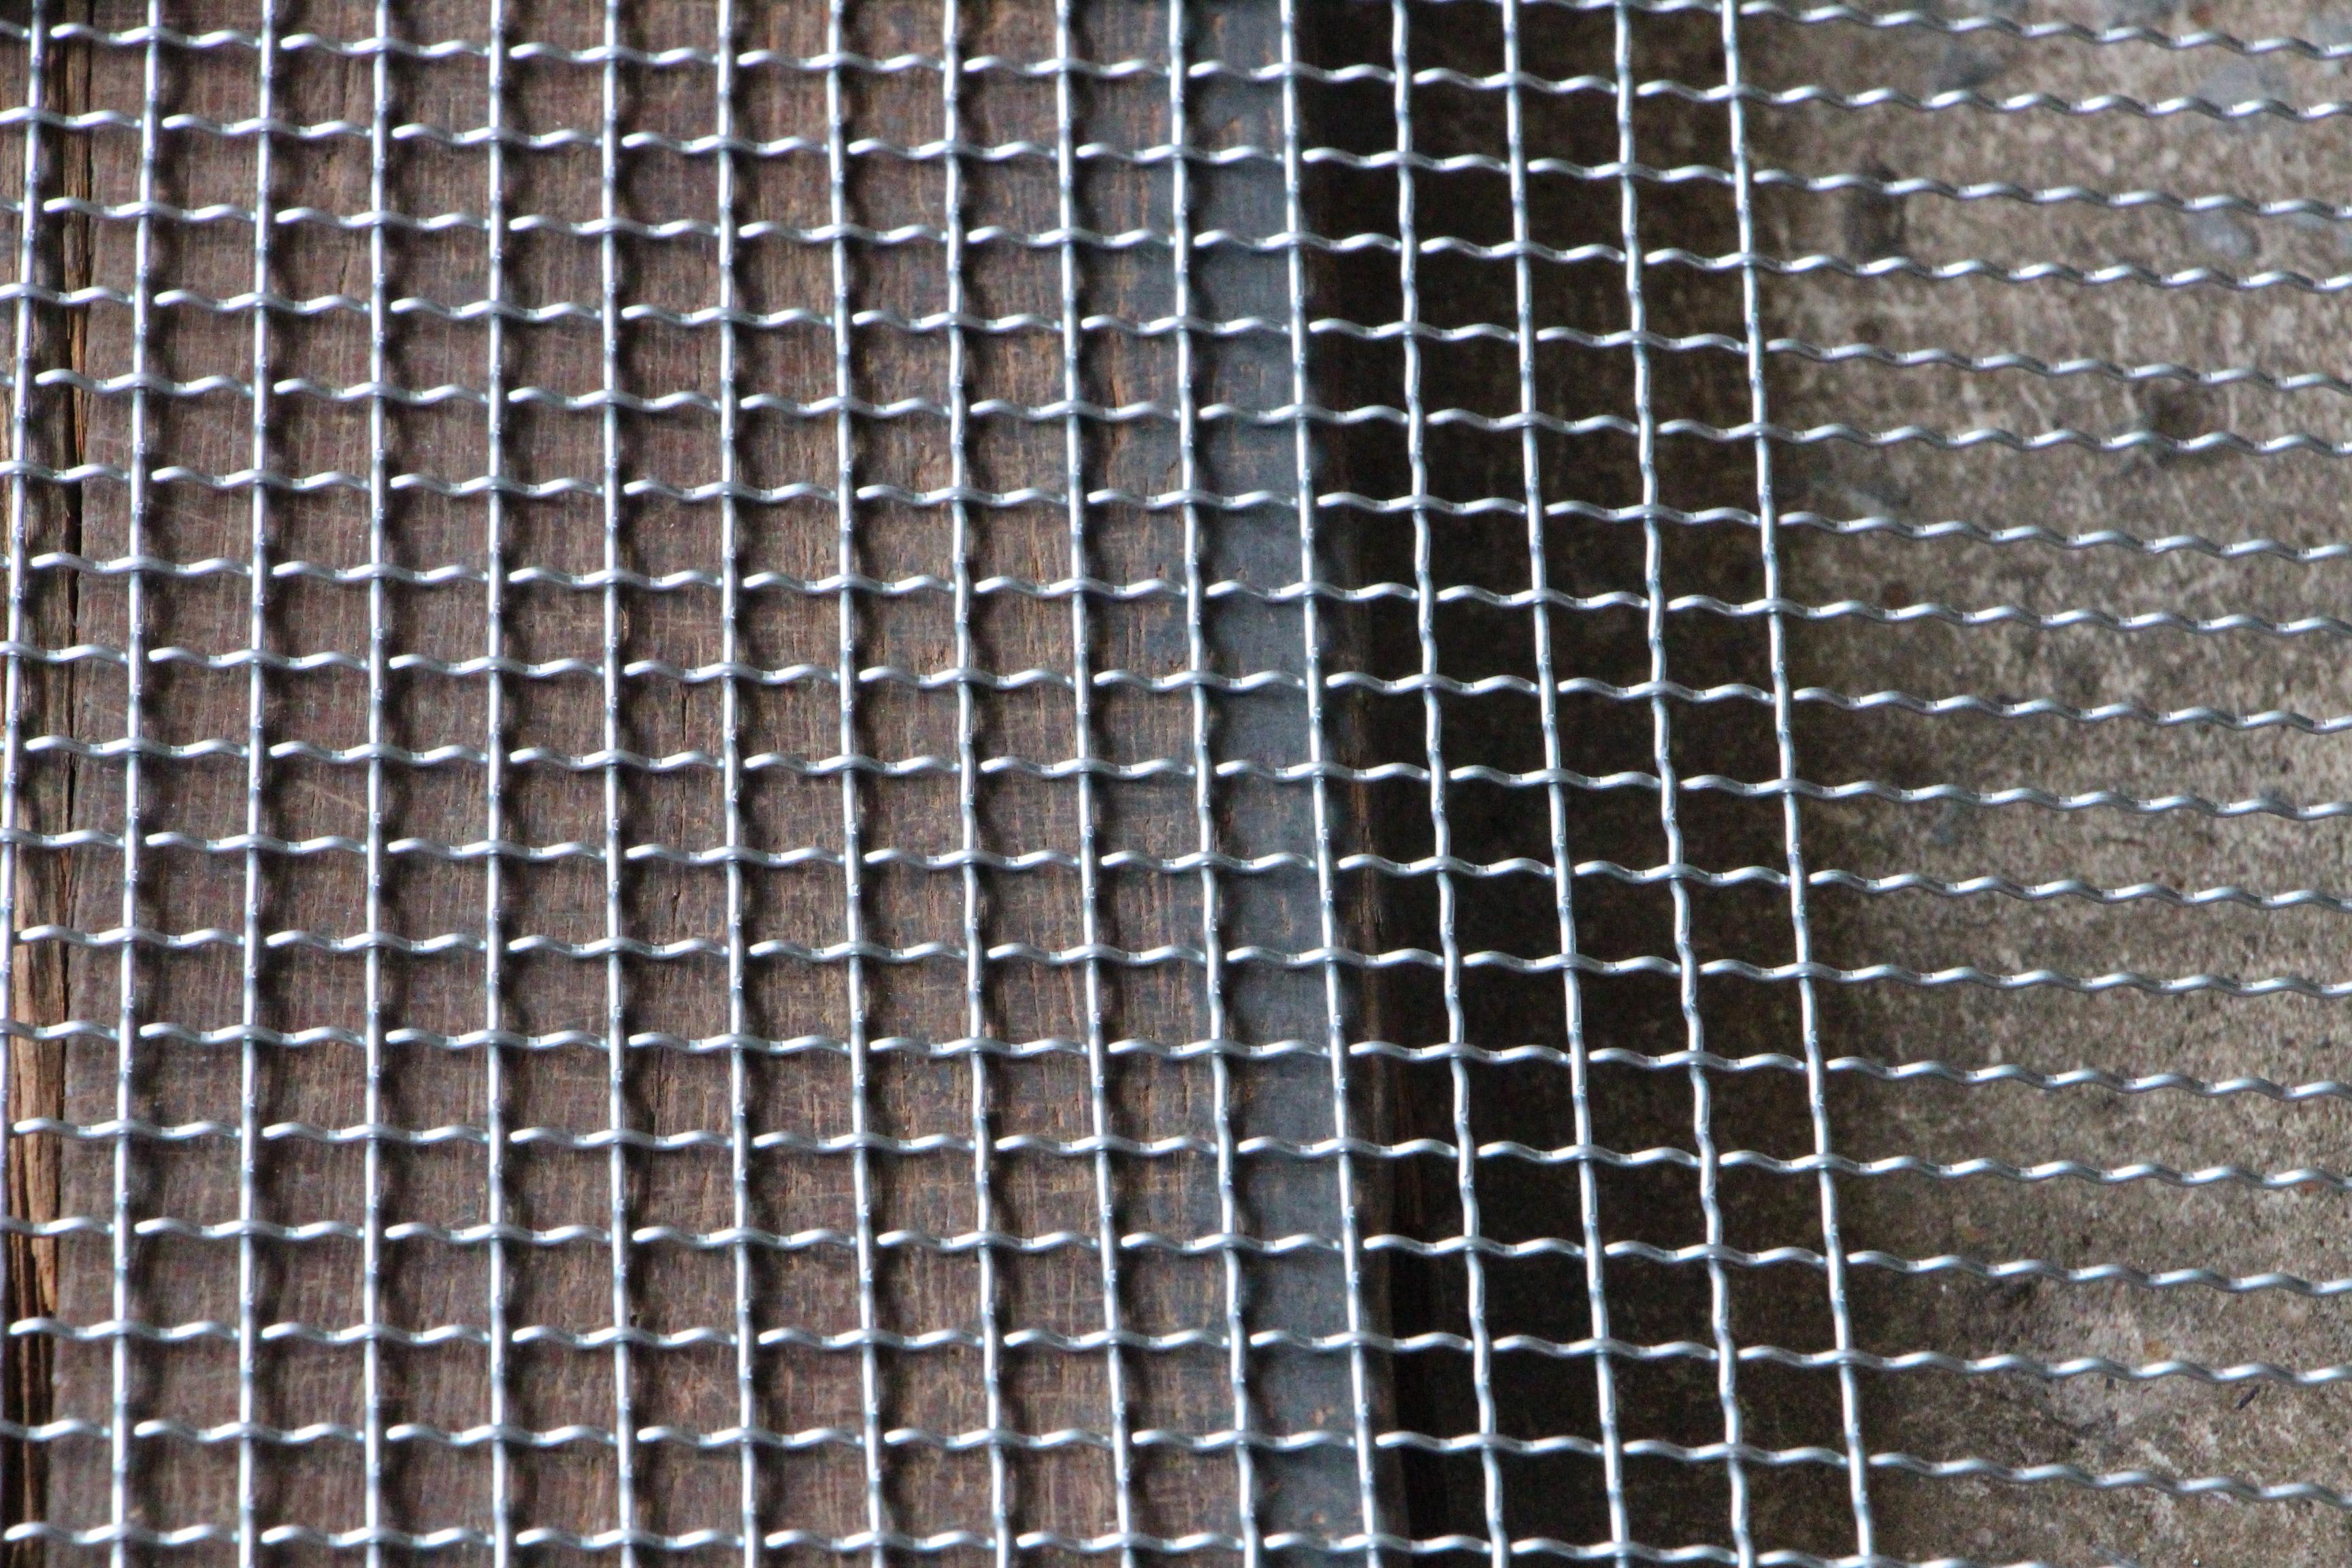 crimped,wire,mesh,wiremesh,steel,galvanized